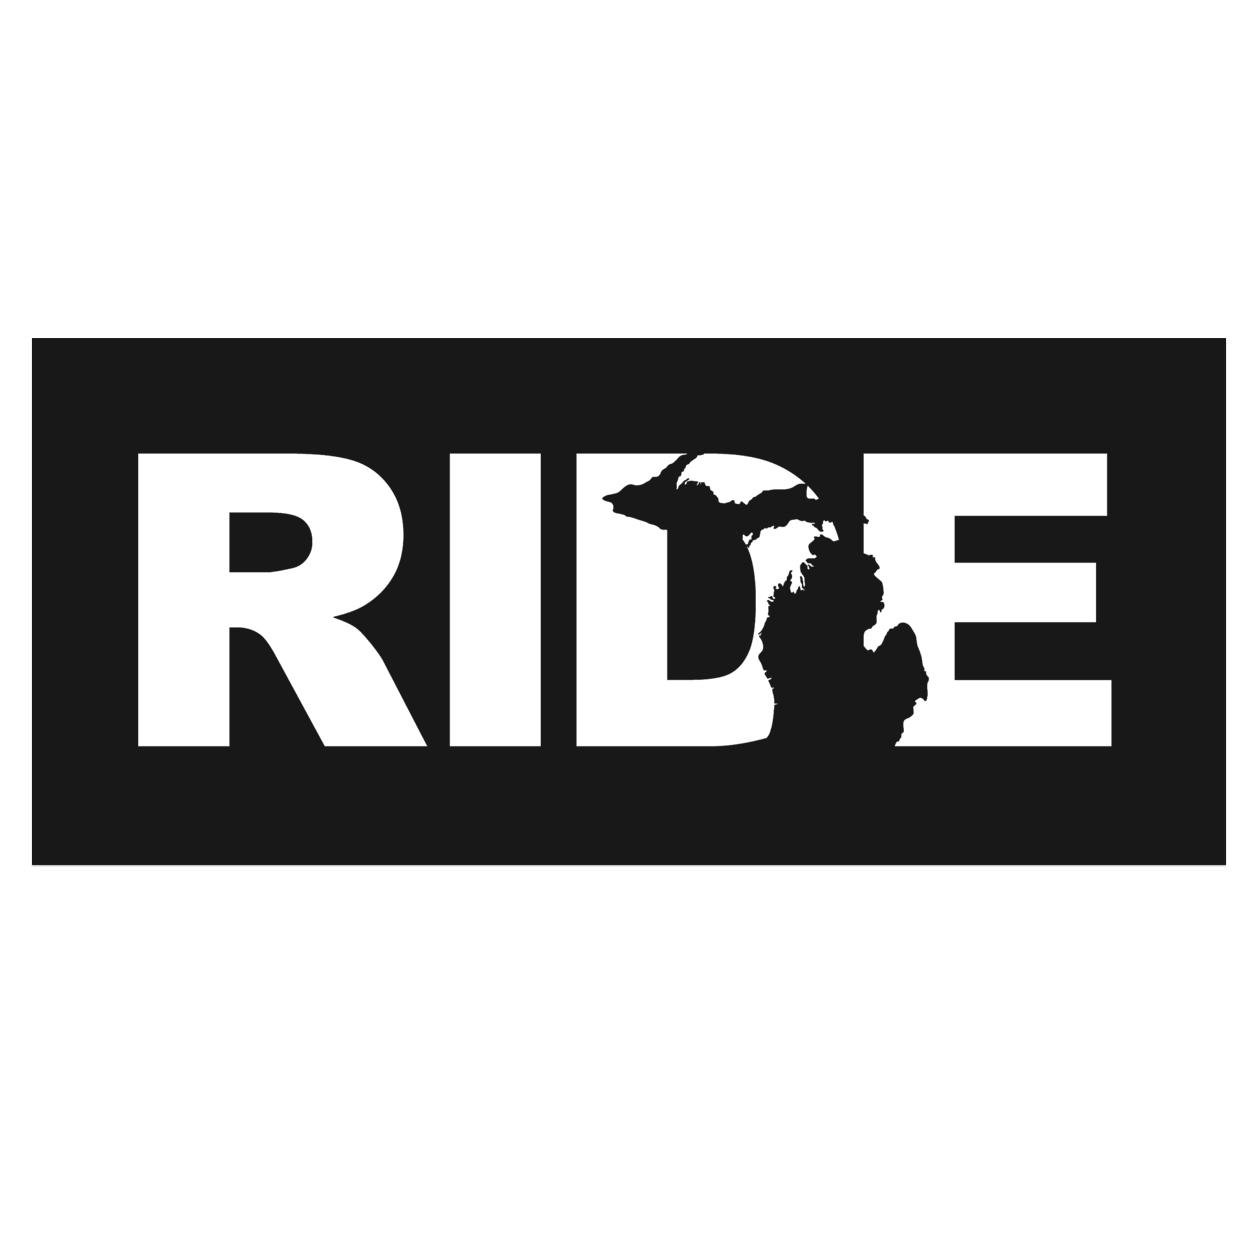 Ride Michigan Classic Hardboard Sign (White Logo)